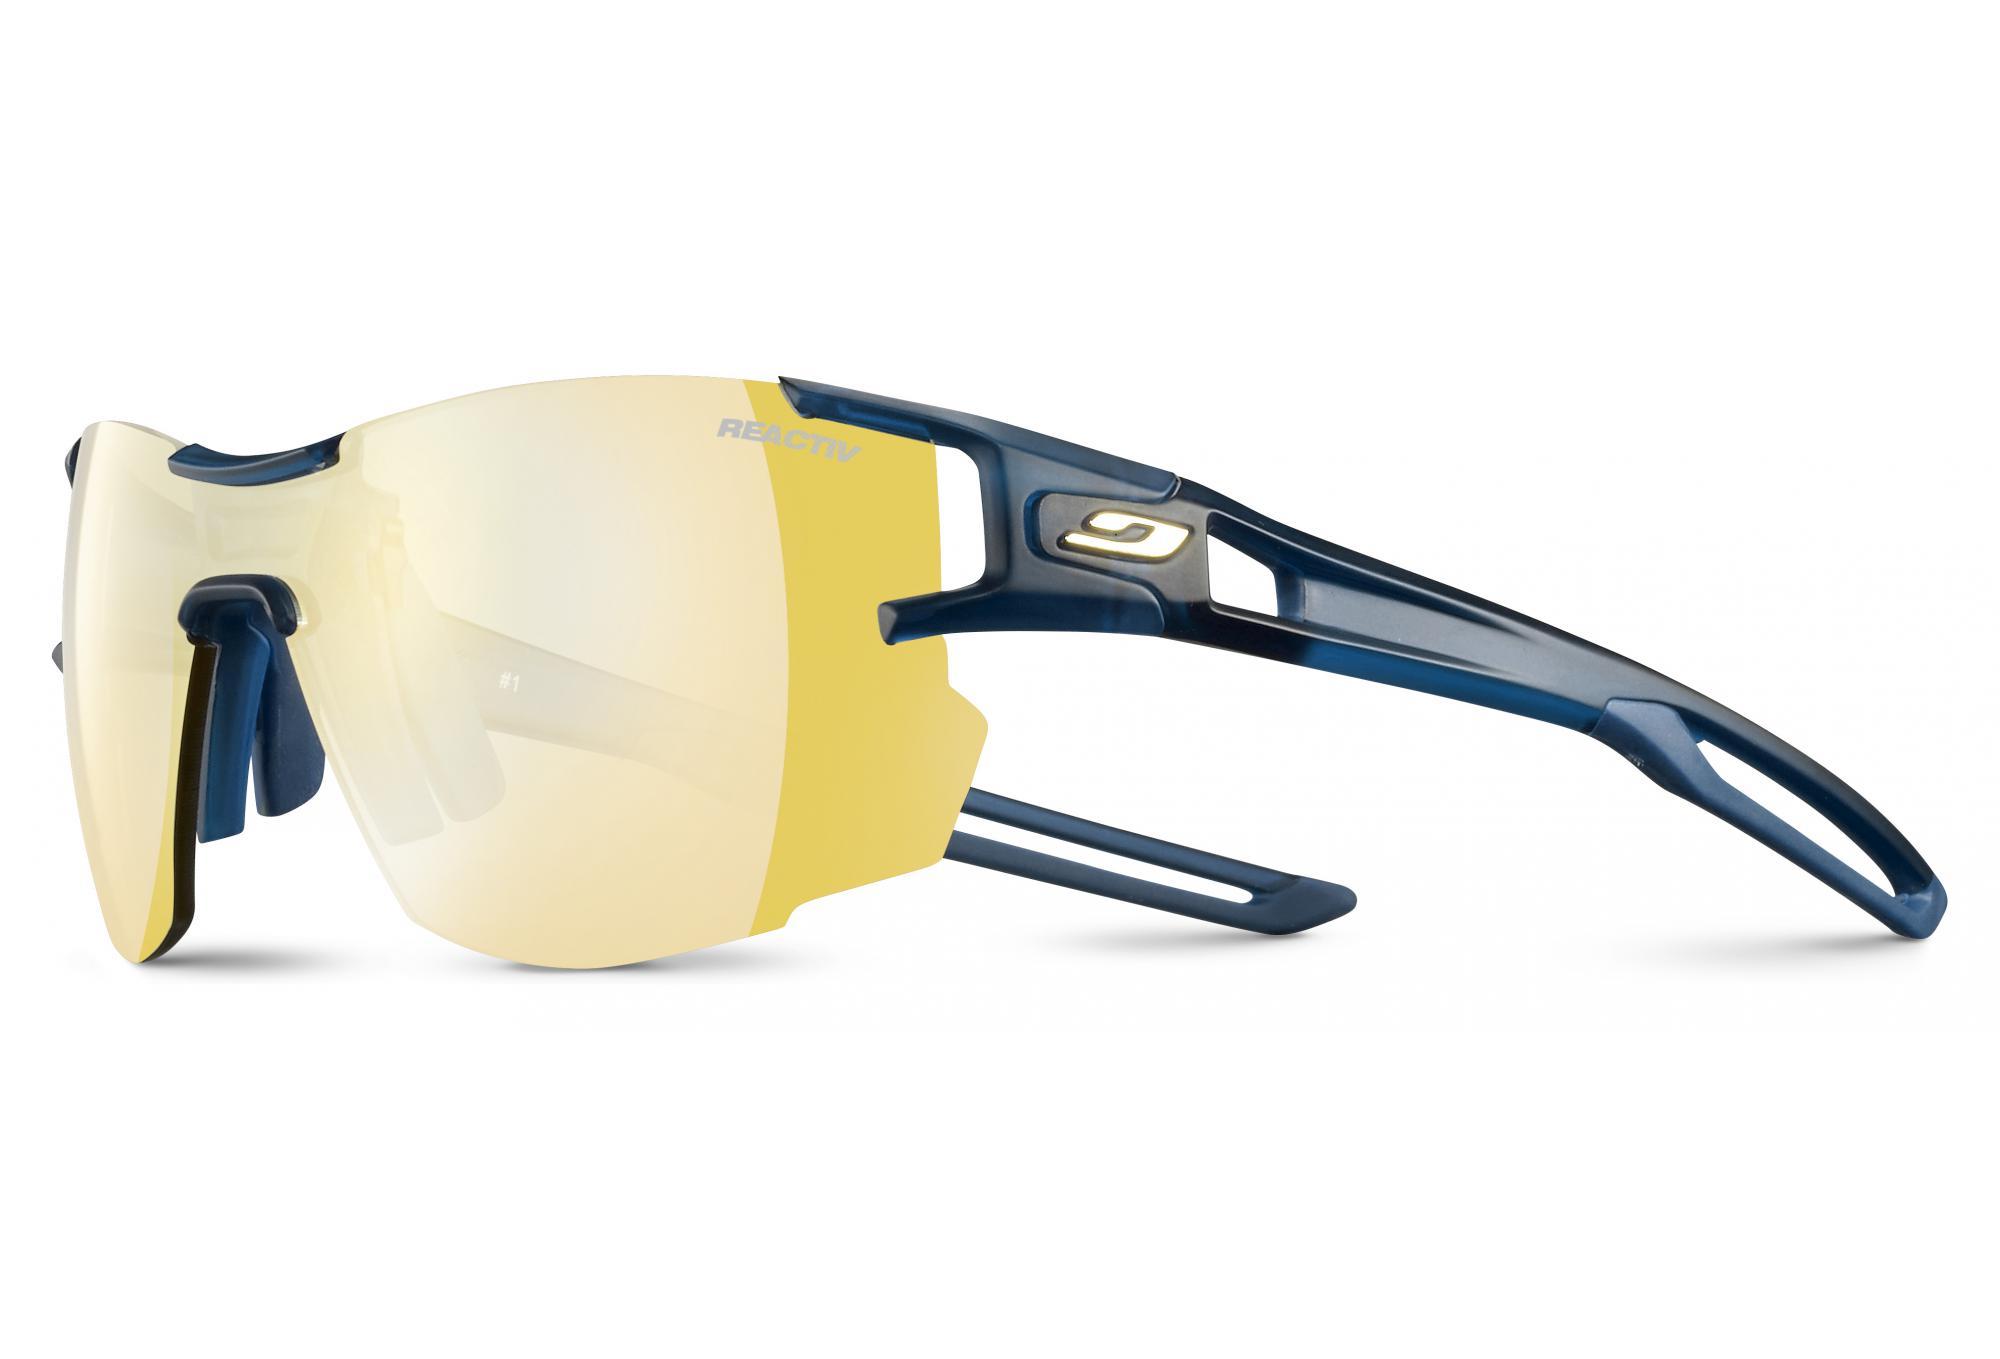 a0a492b391 Julbo Aero Zebra Light glasses Blue - Yellow